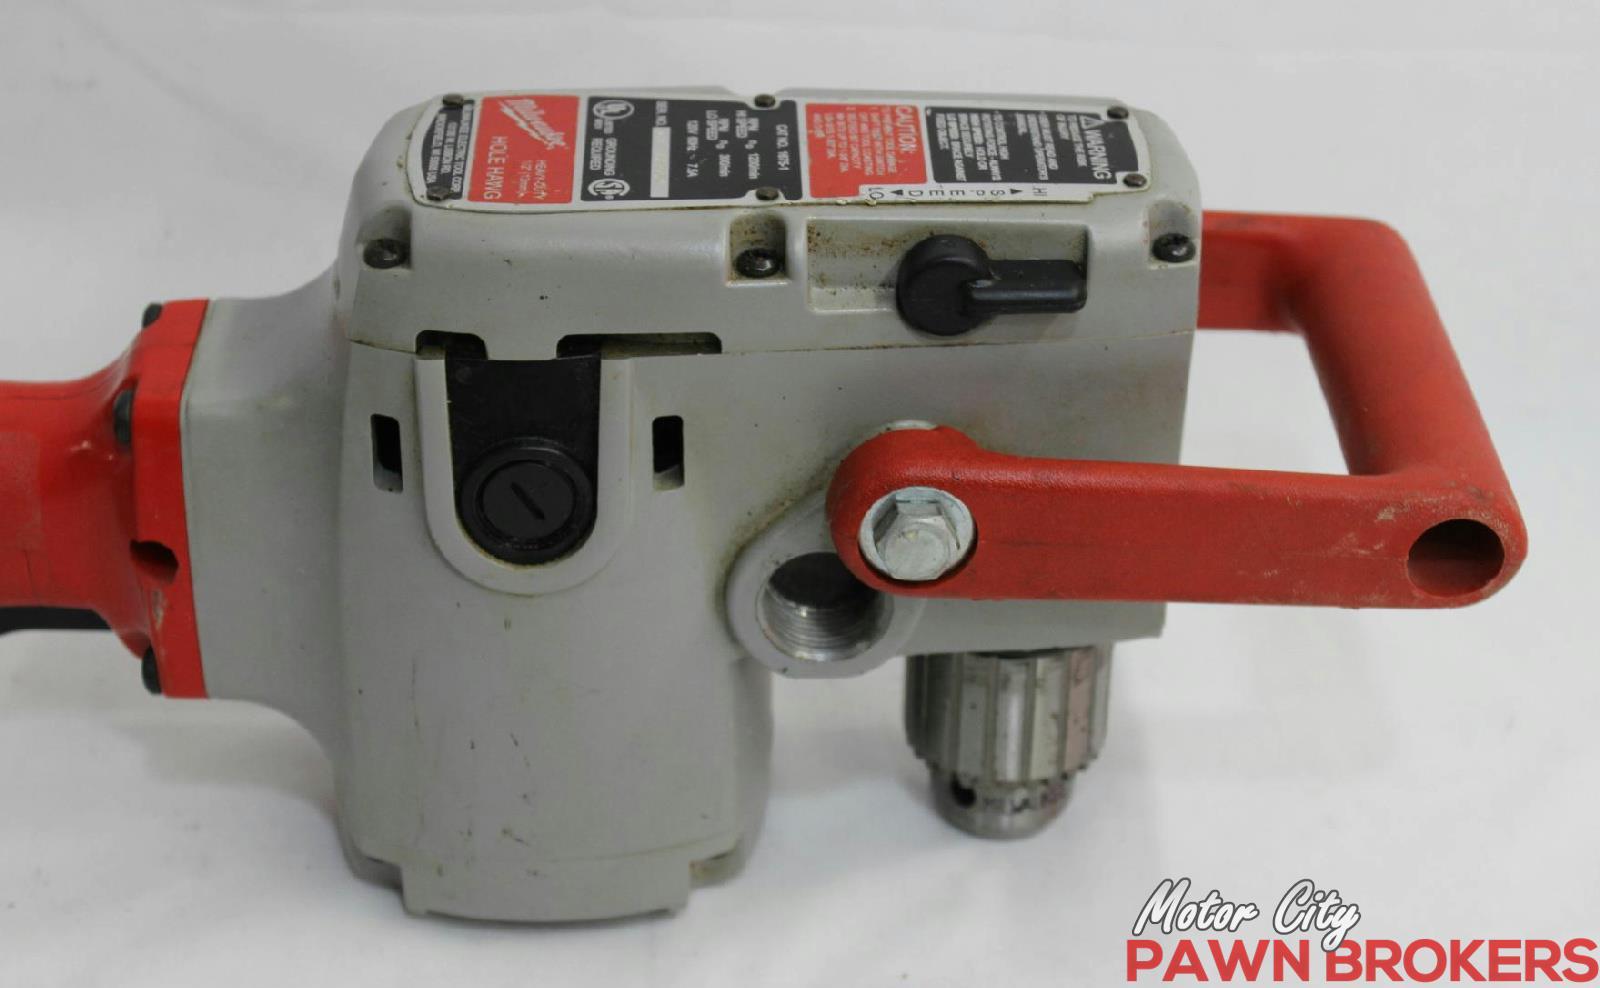 Milwaukee 1675 6 hole hawg 7 5 amp 1 2 inch joist for Motor city pawn shop